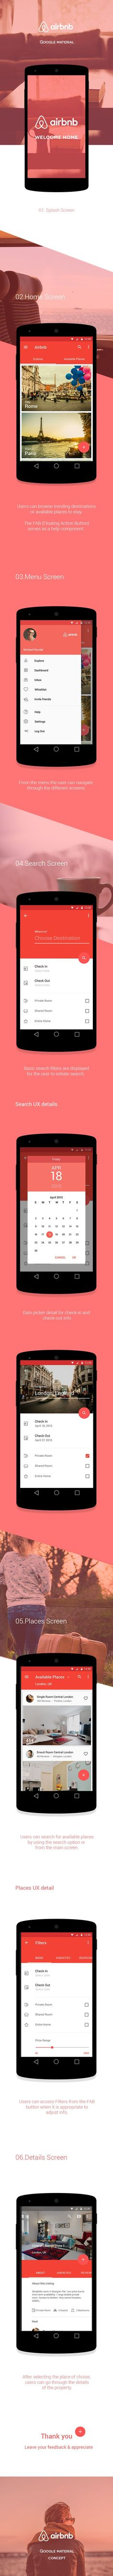 Airbnb - Google Material | Abduzeedo Design Inspiration: